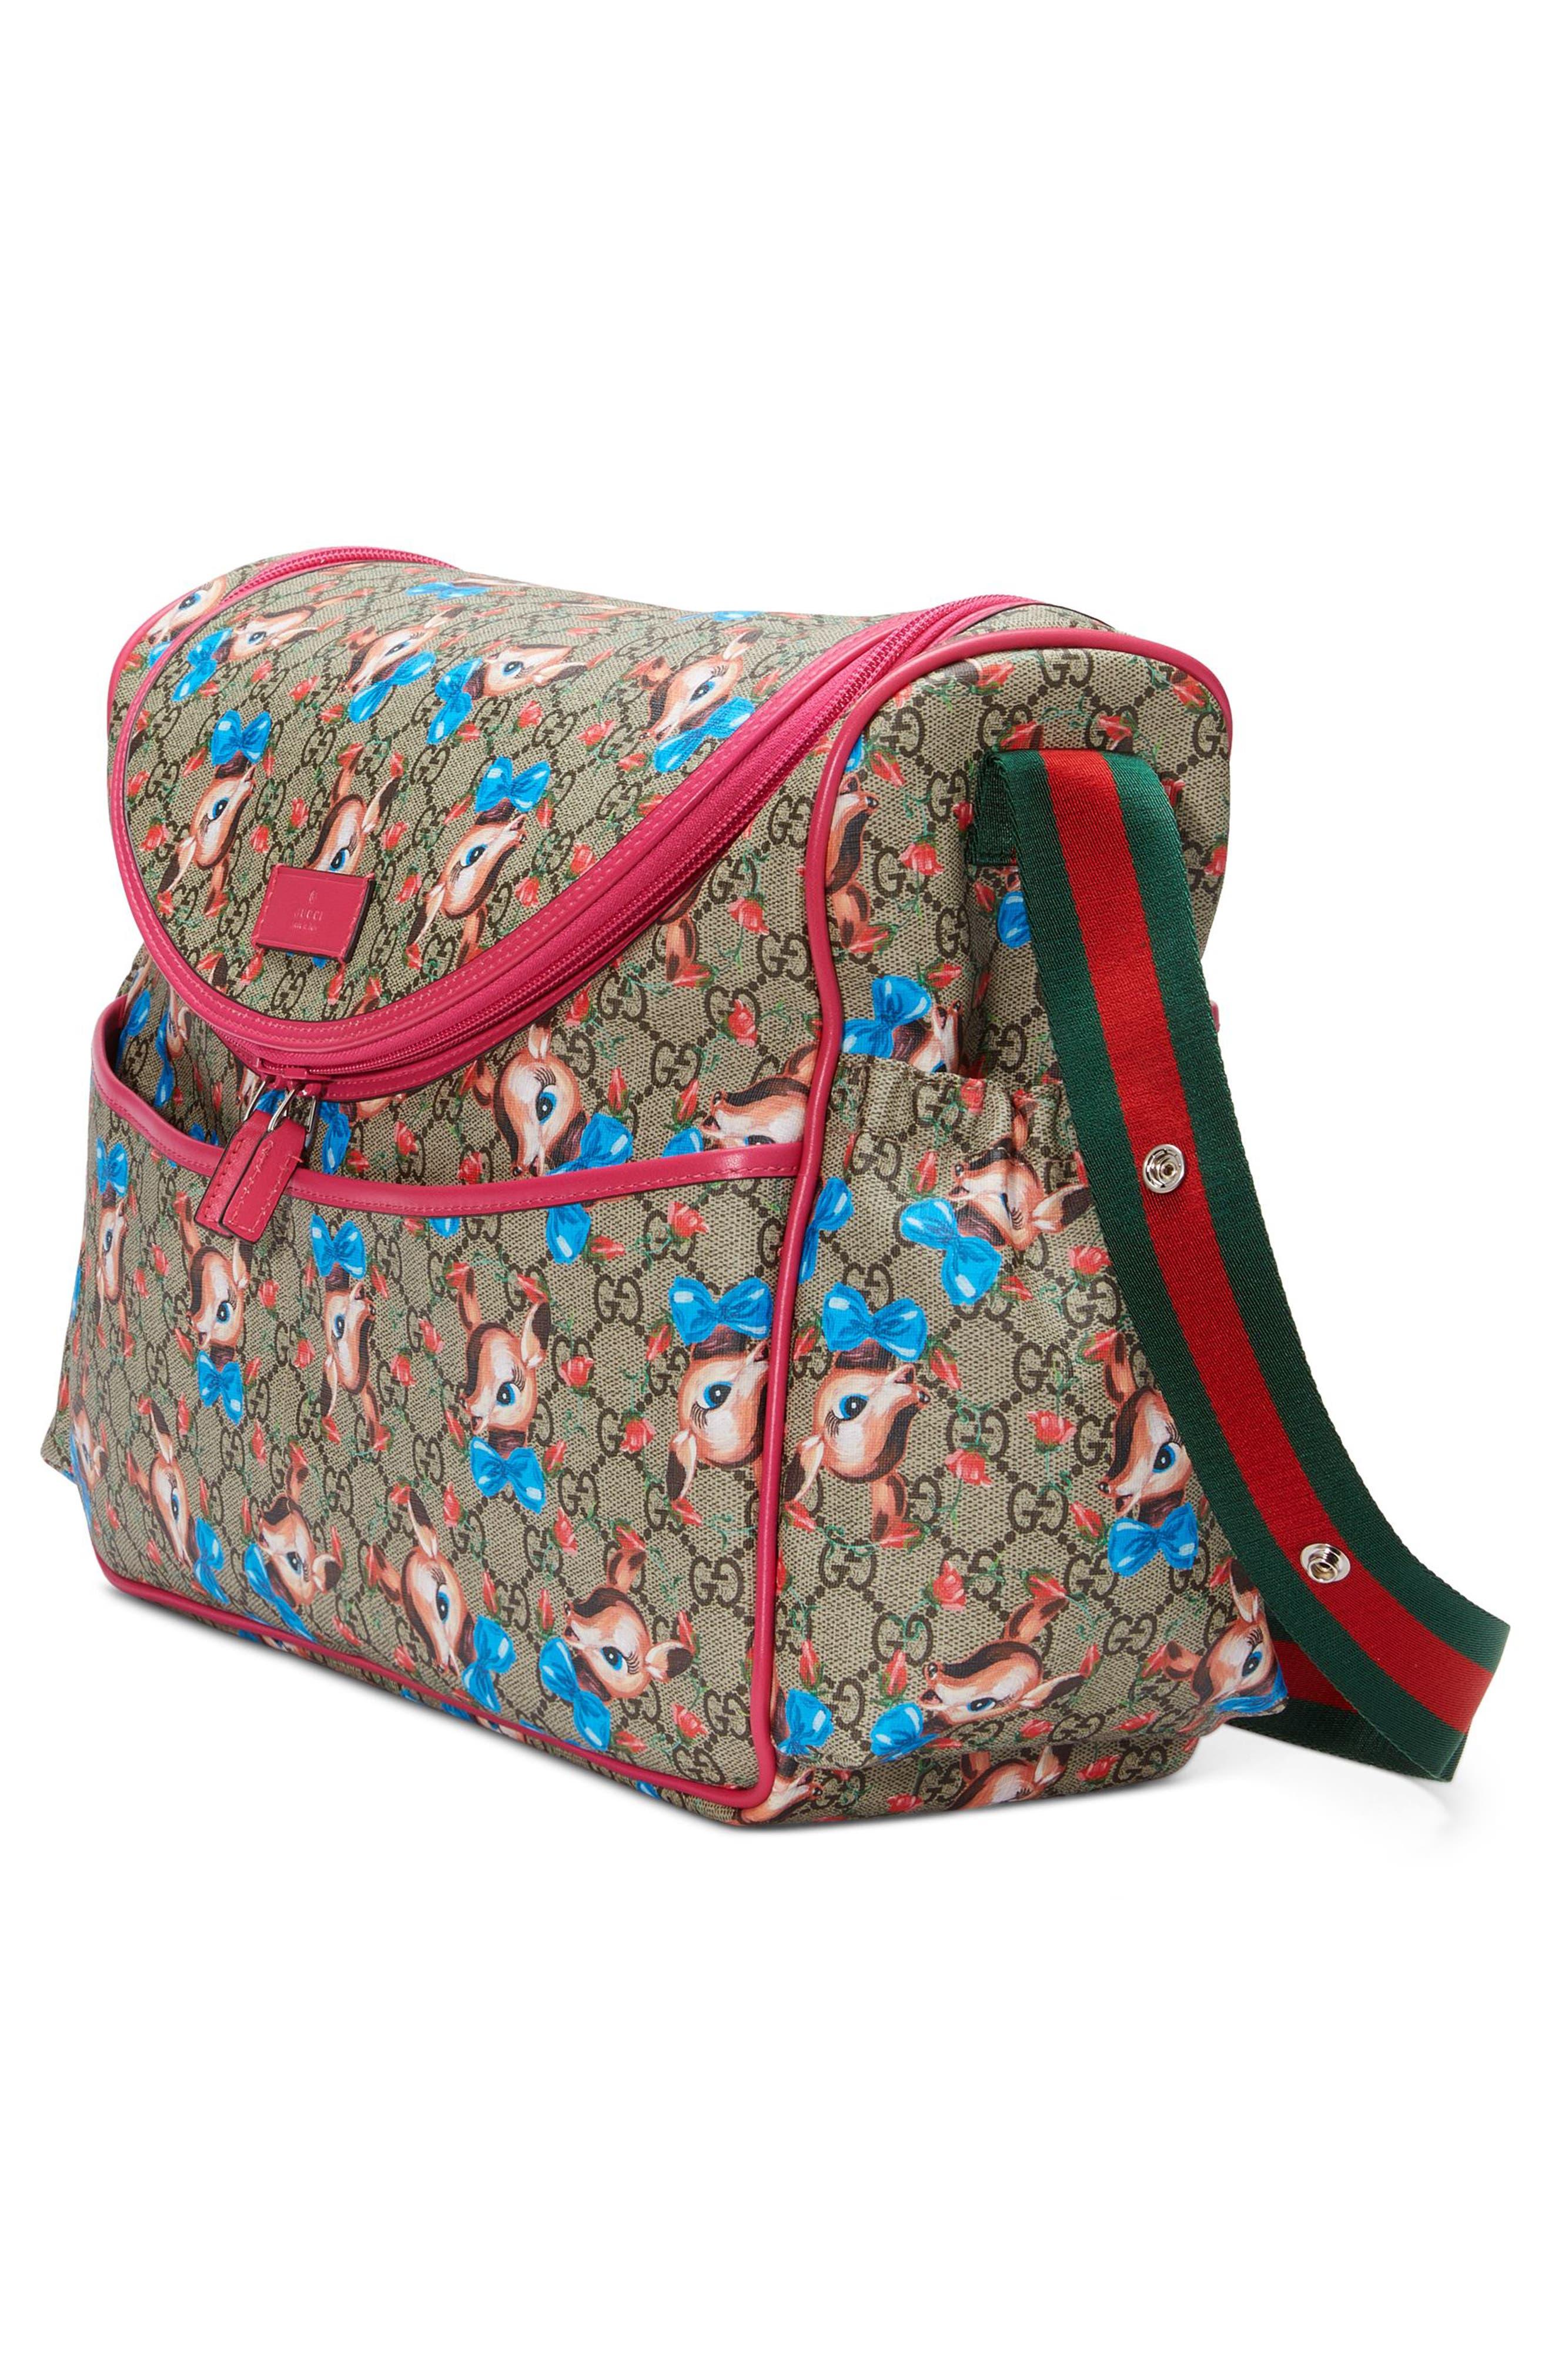 Deer & Rose Bud GG Supreme Canvas Diaper Bag,                             Alternate thumbnail 4, color,                             250